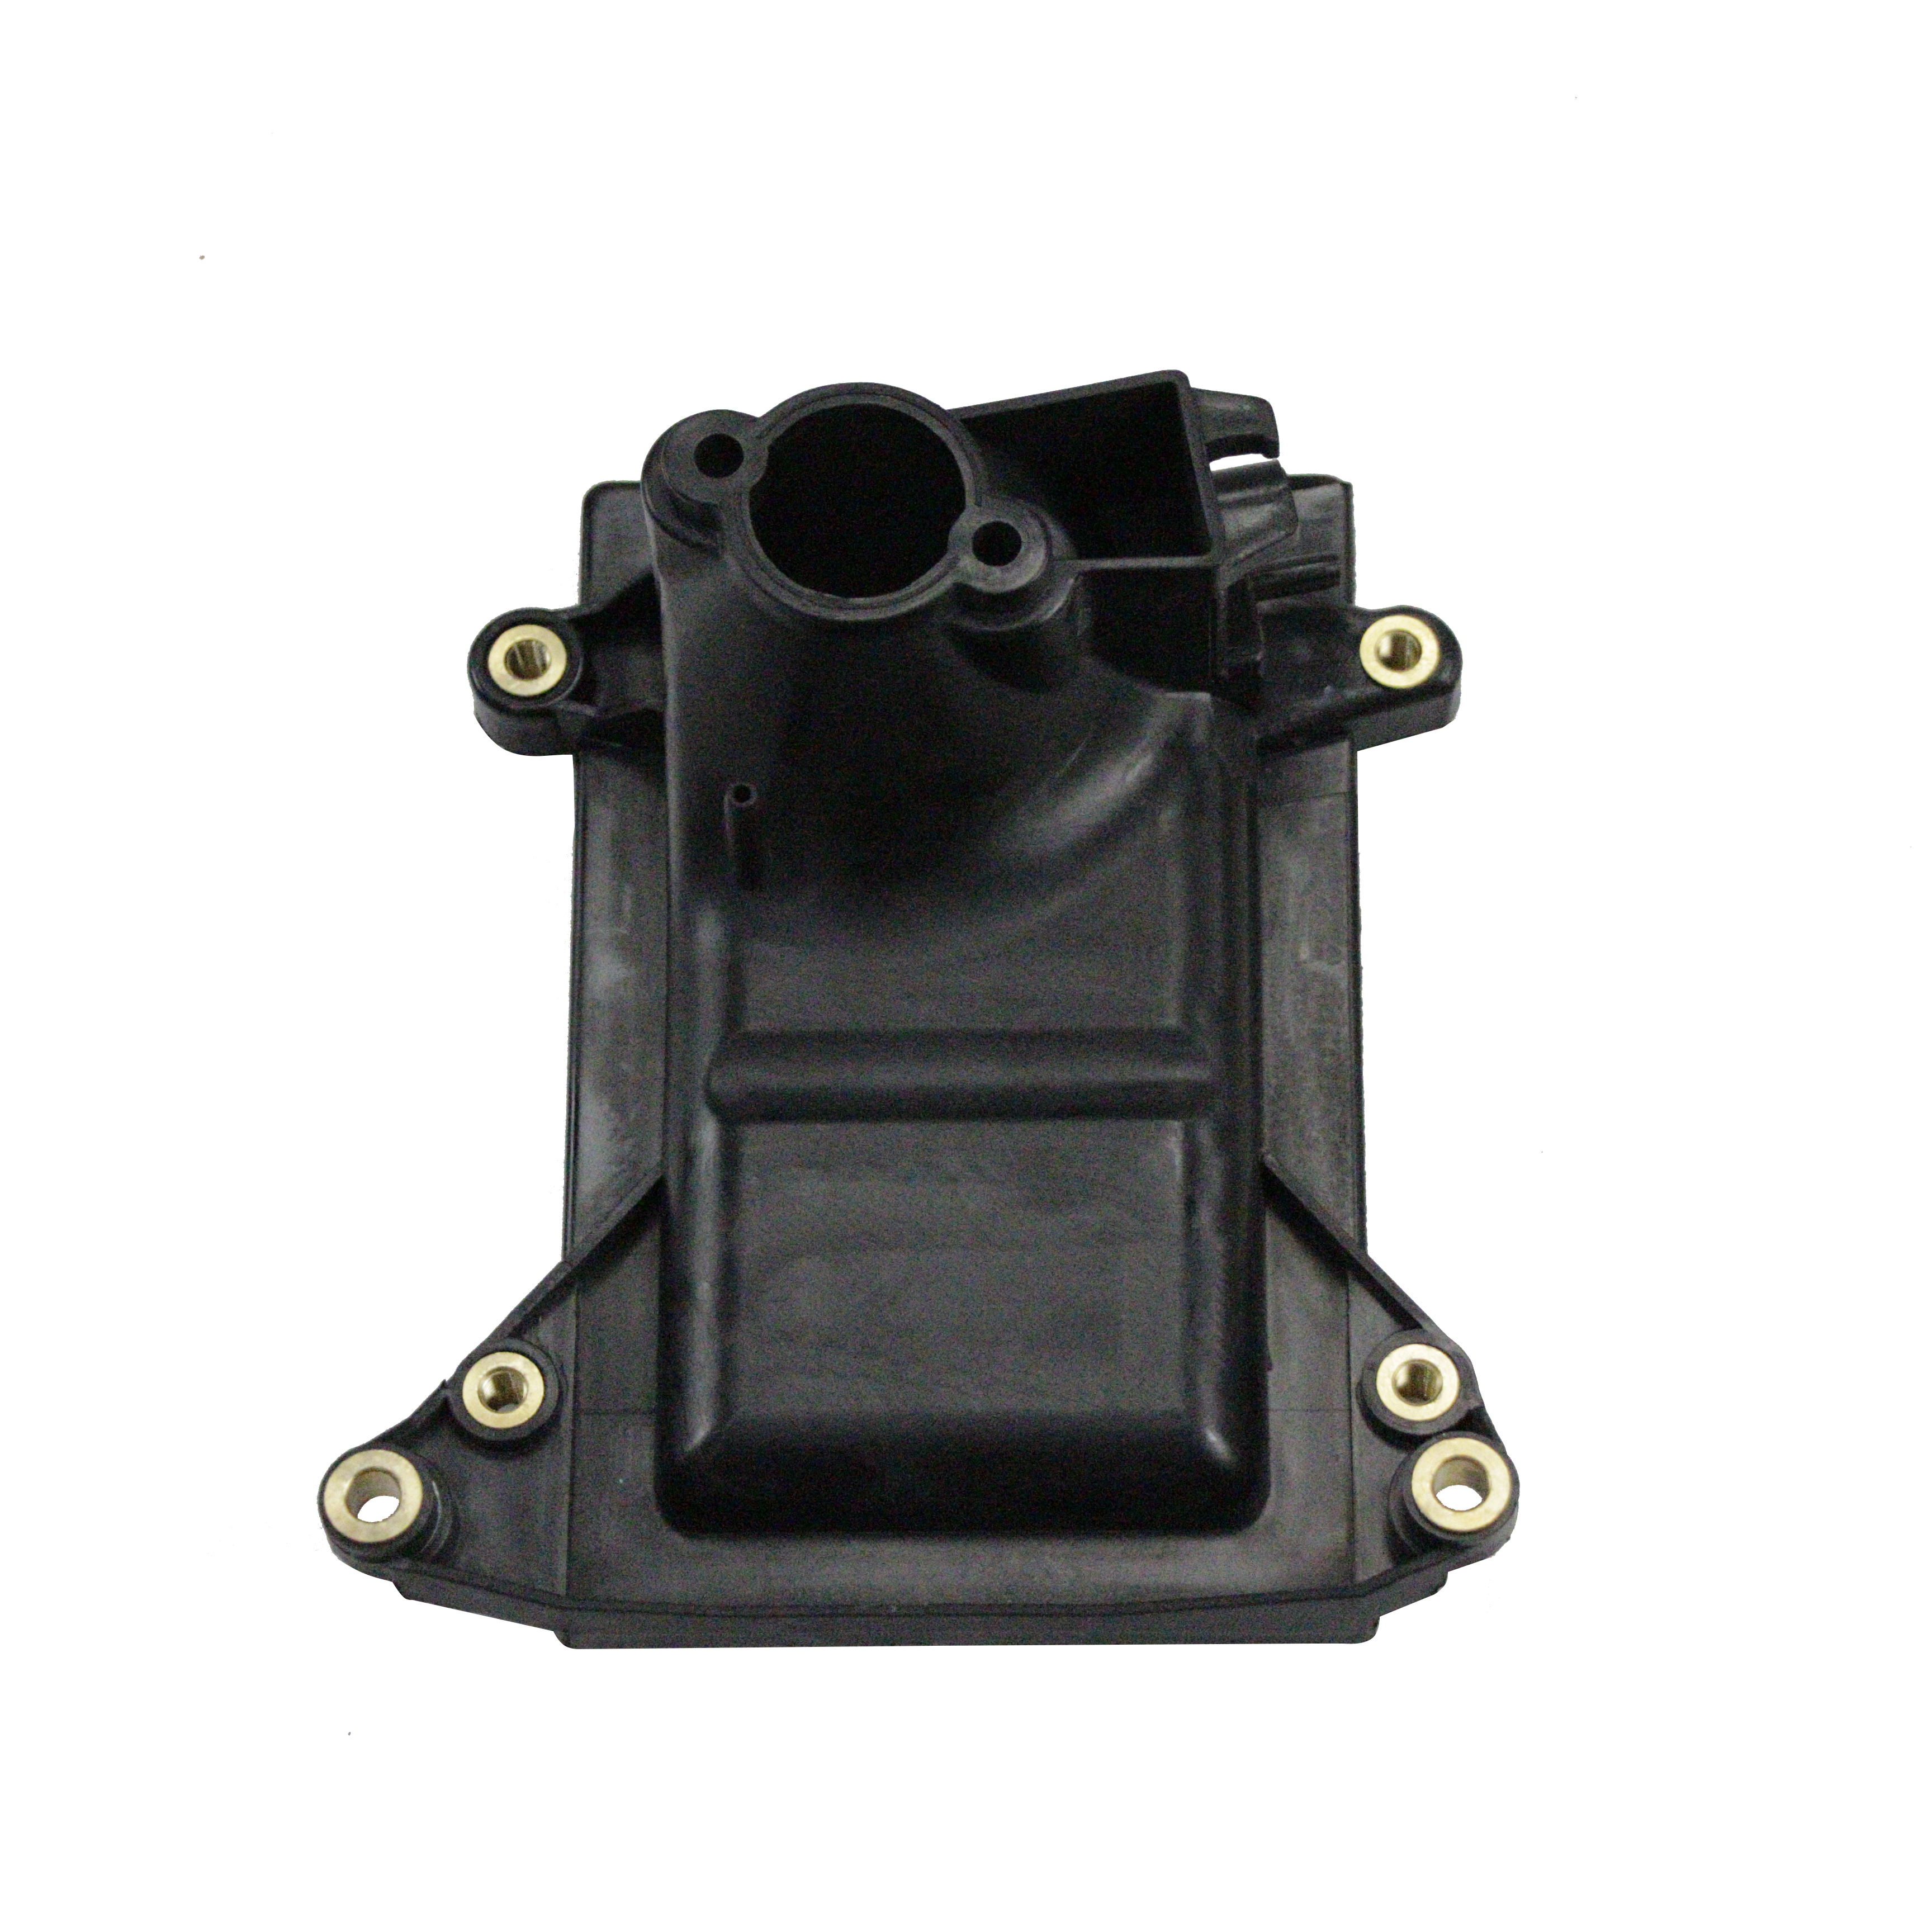 5X Torsion Spring F Stihl TS400 Shutdown Rod Concrete Cut-off OEM 4223 435 2100